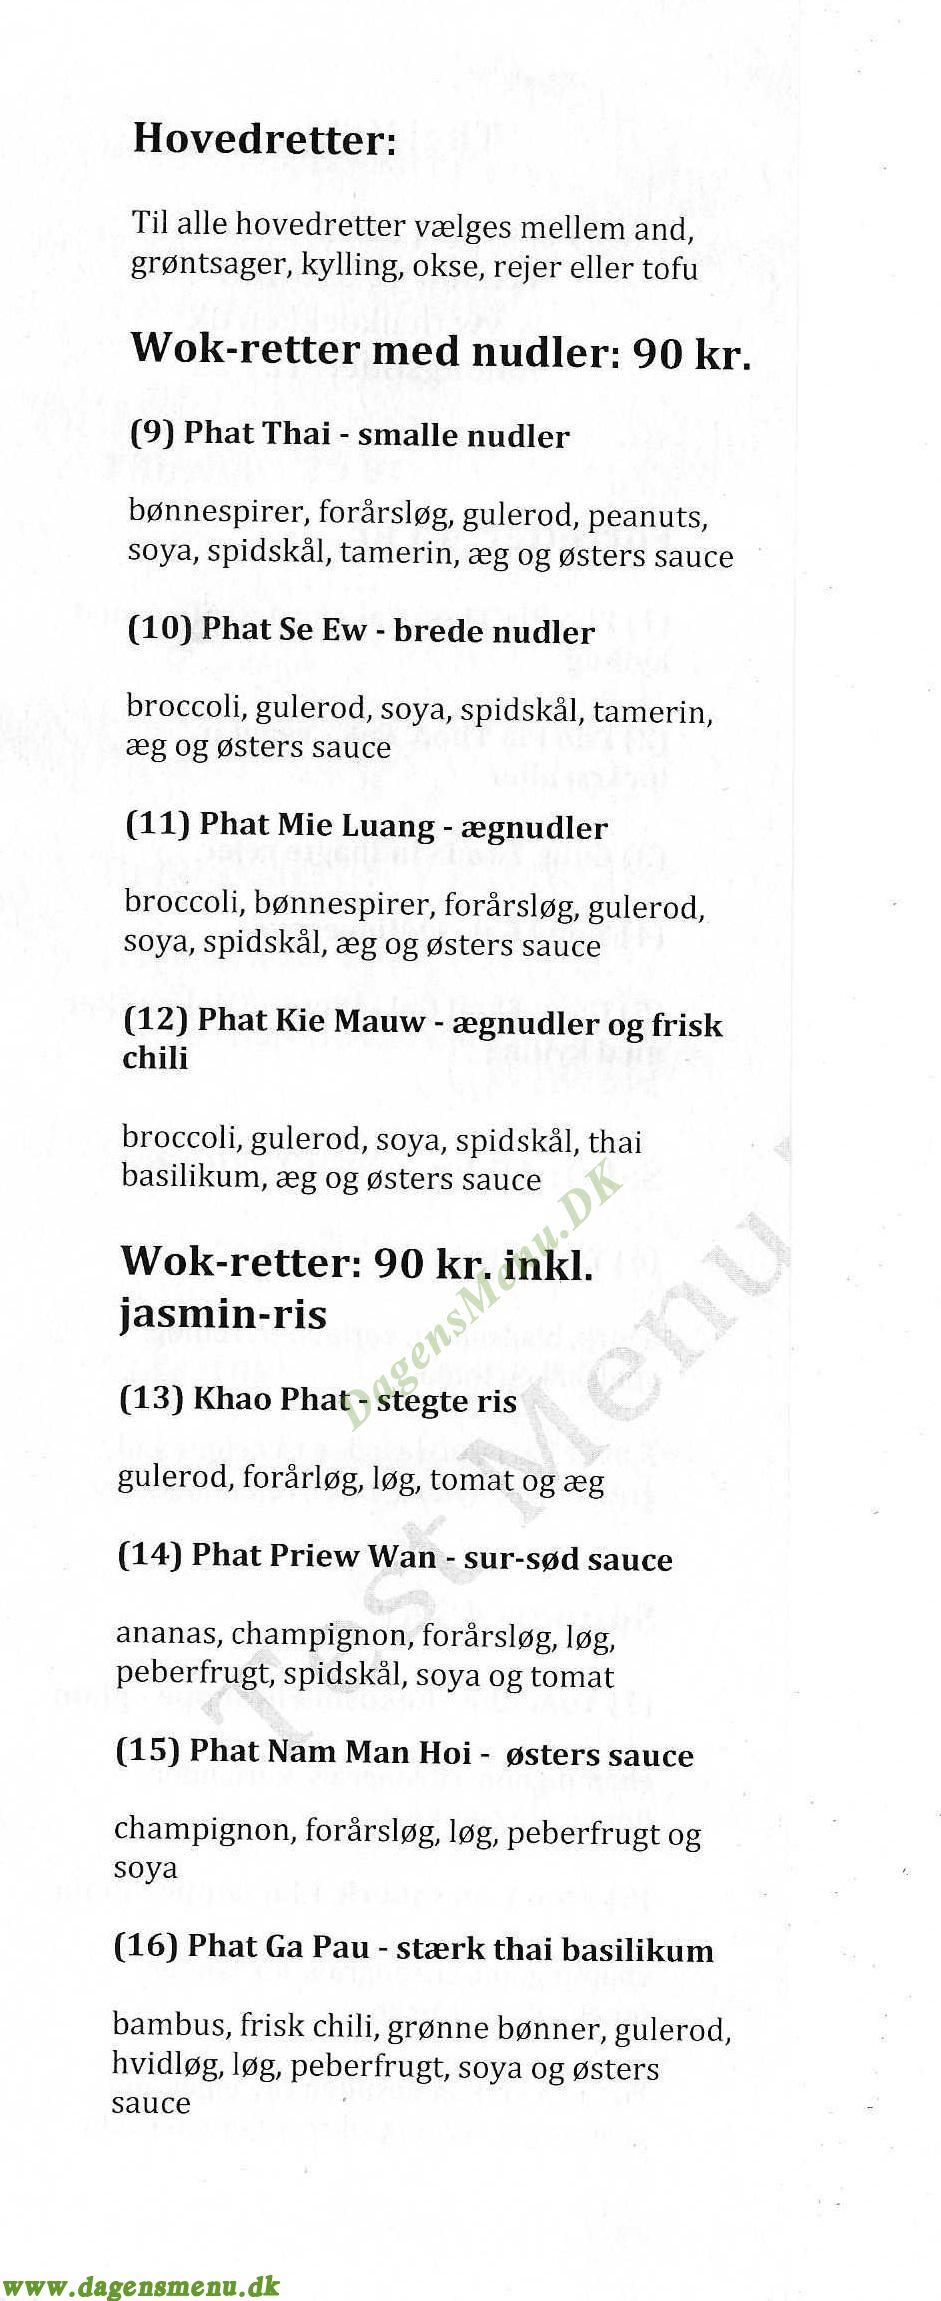 Thai Køkken - Menukort